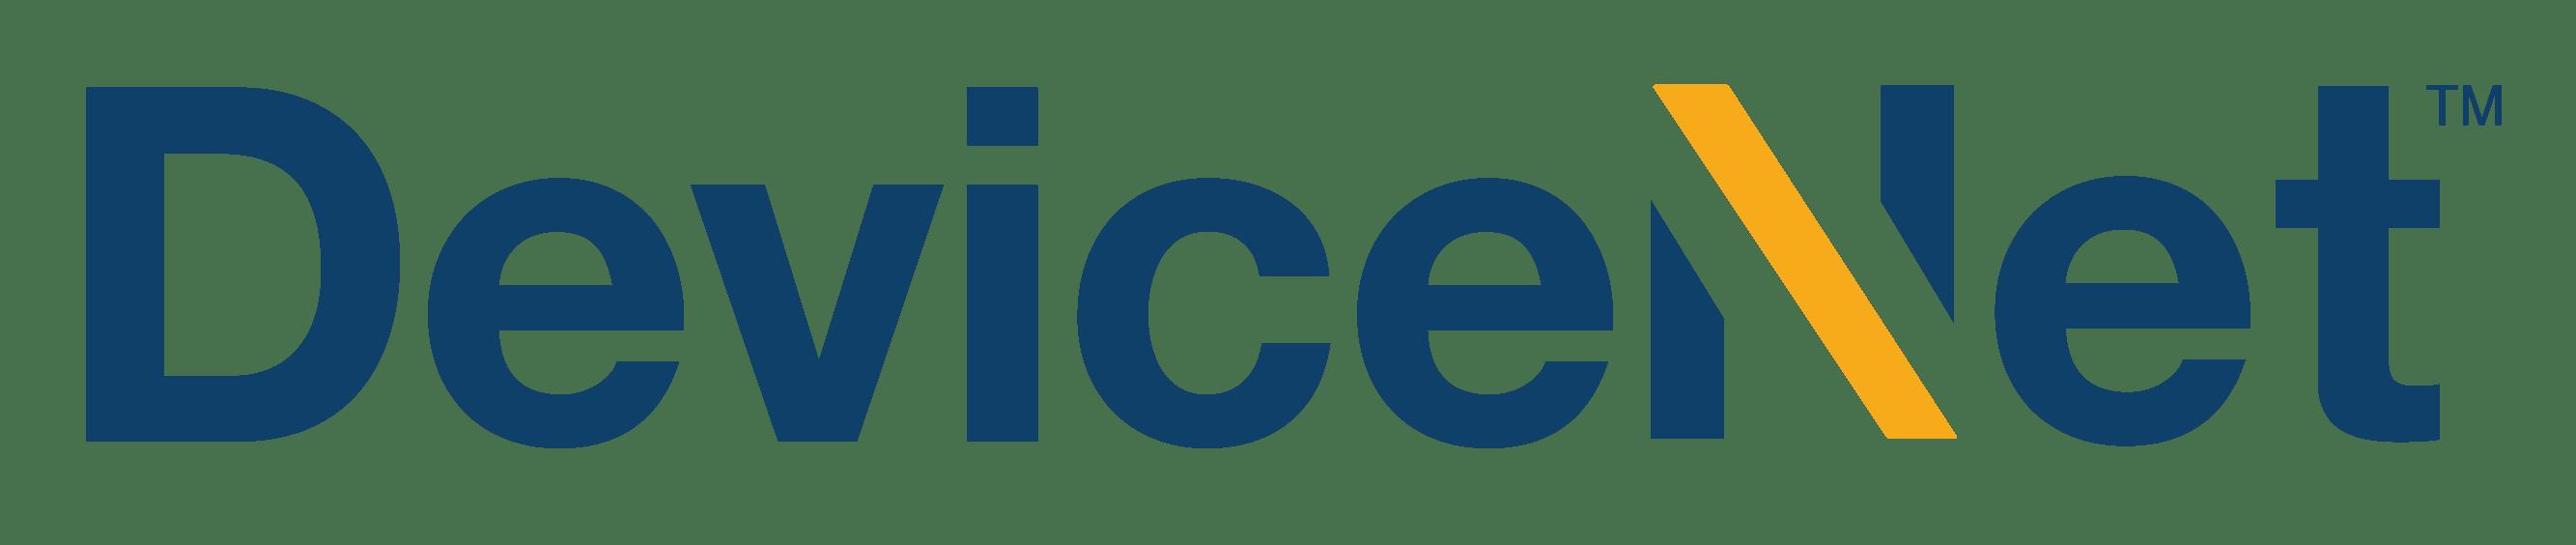 DeviceNet Embedded Software Development